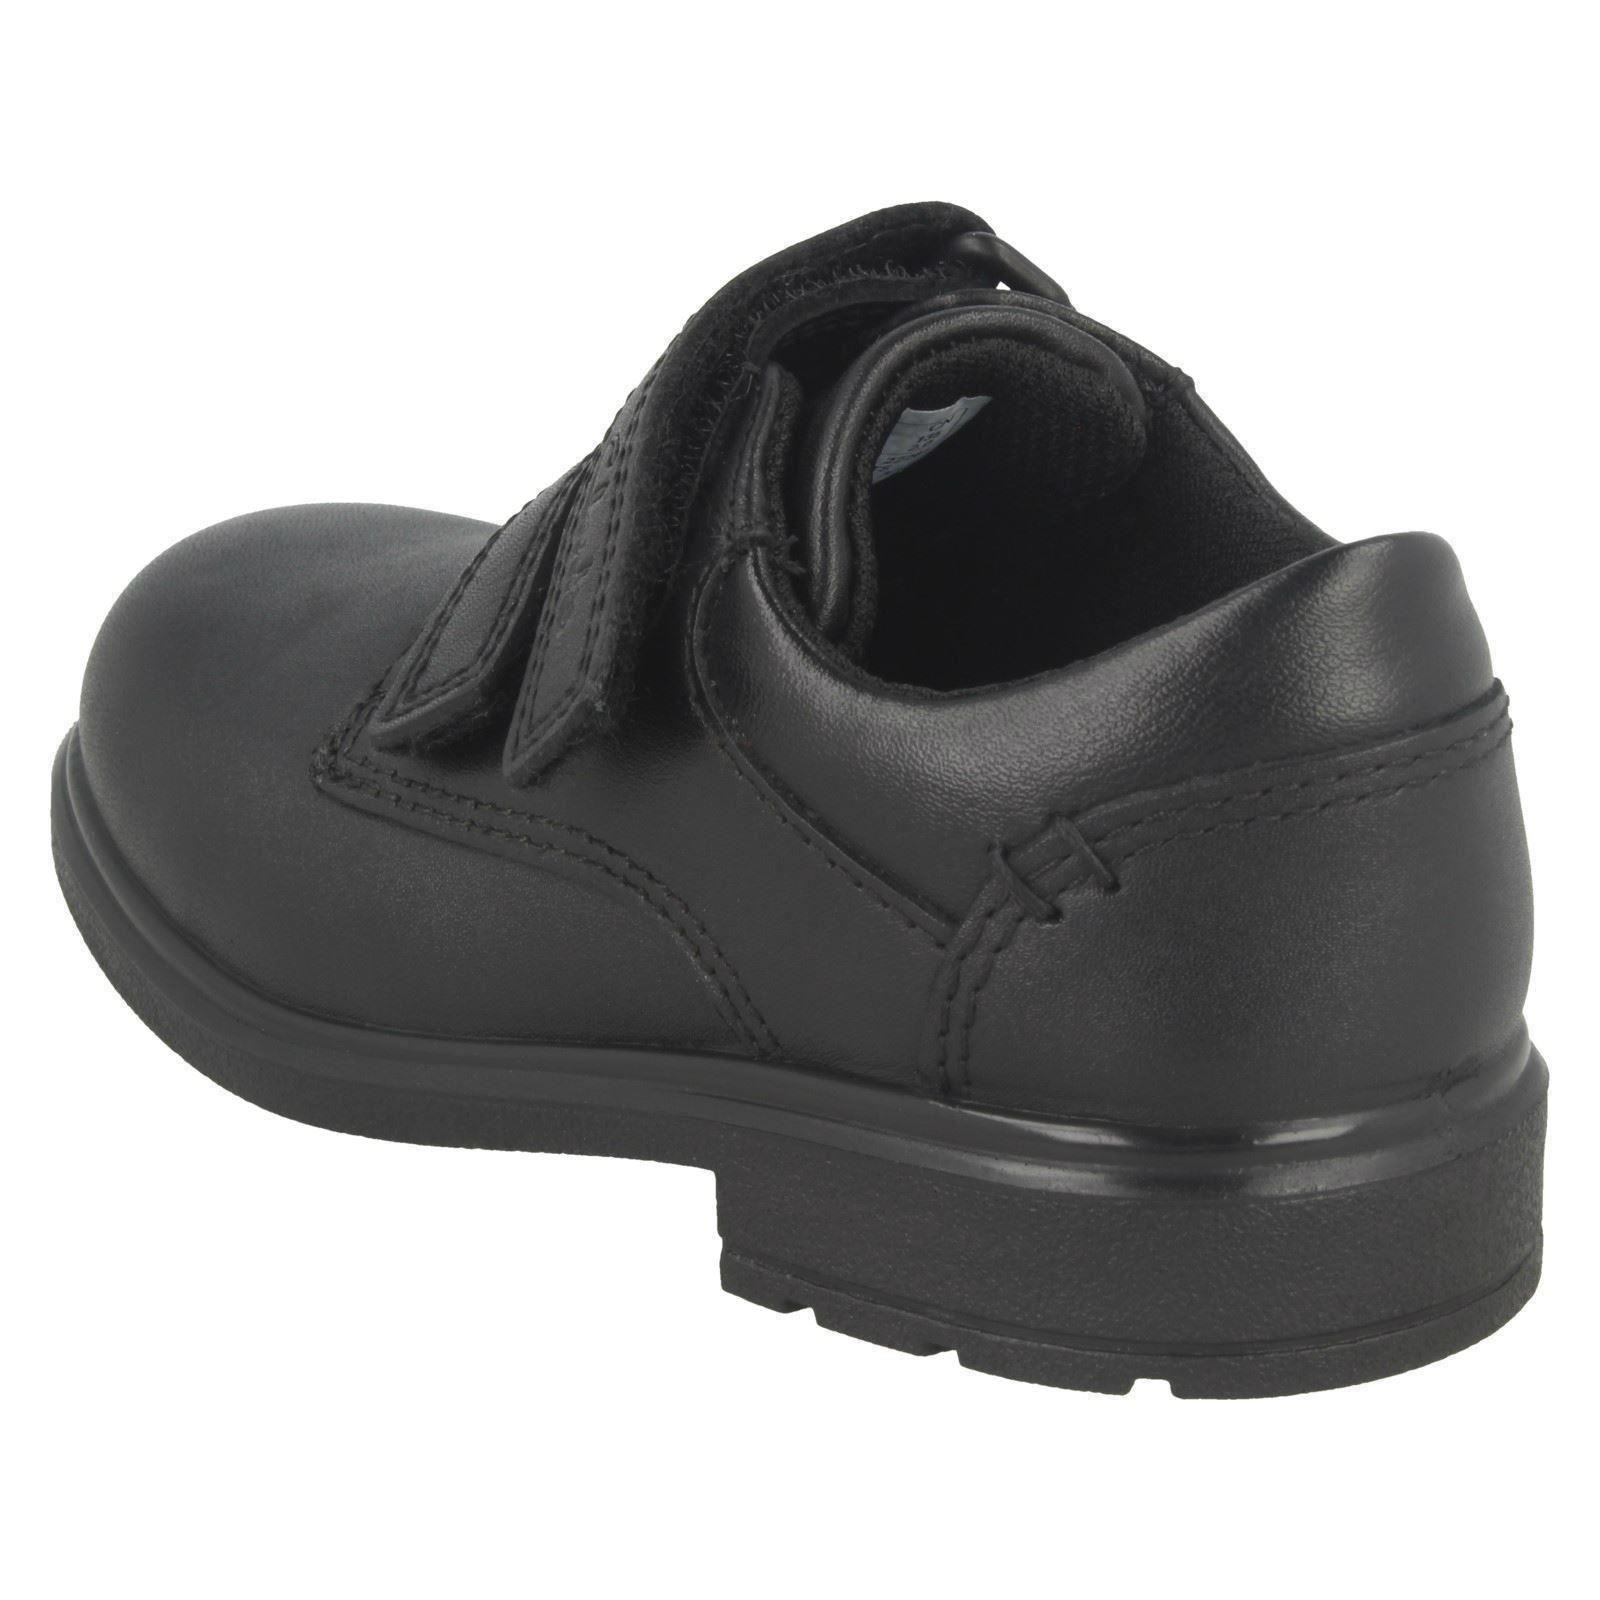 Boys Gloforms By Clarks Double Strap School Shoes /'Maris Fire/'